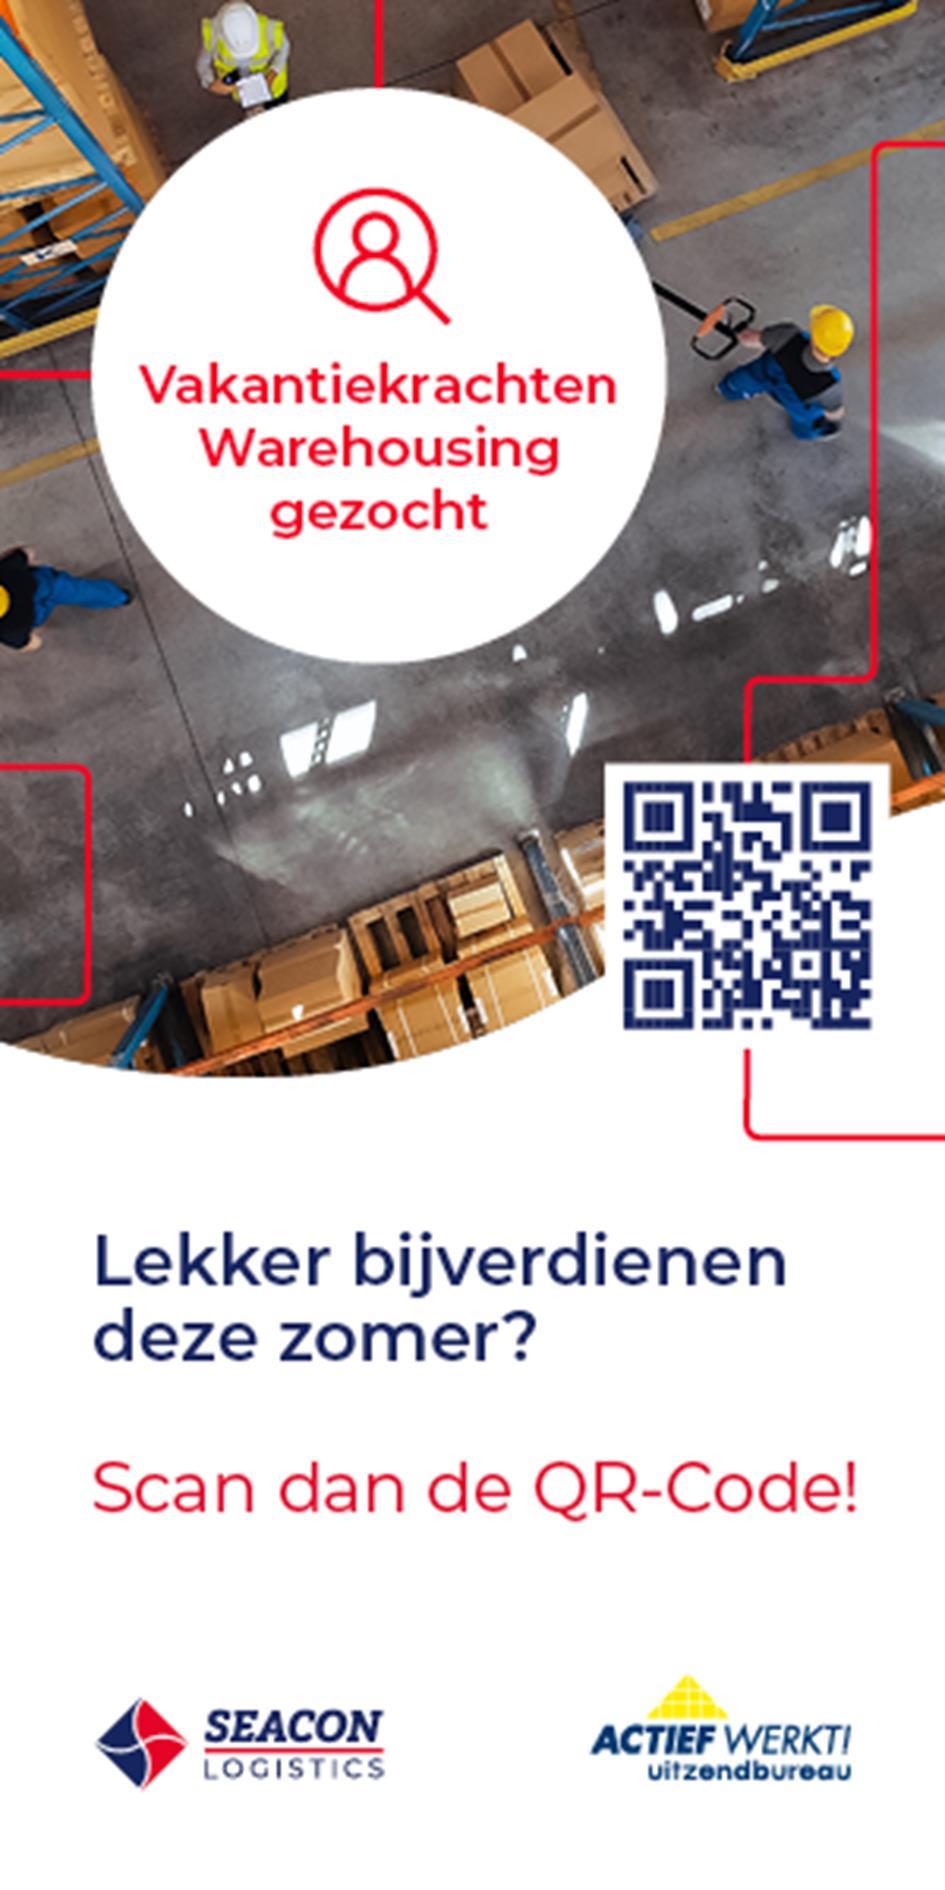 post_image_seacon_vakantiekrachten_300x600px_nl.png